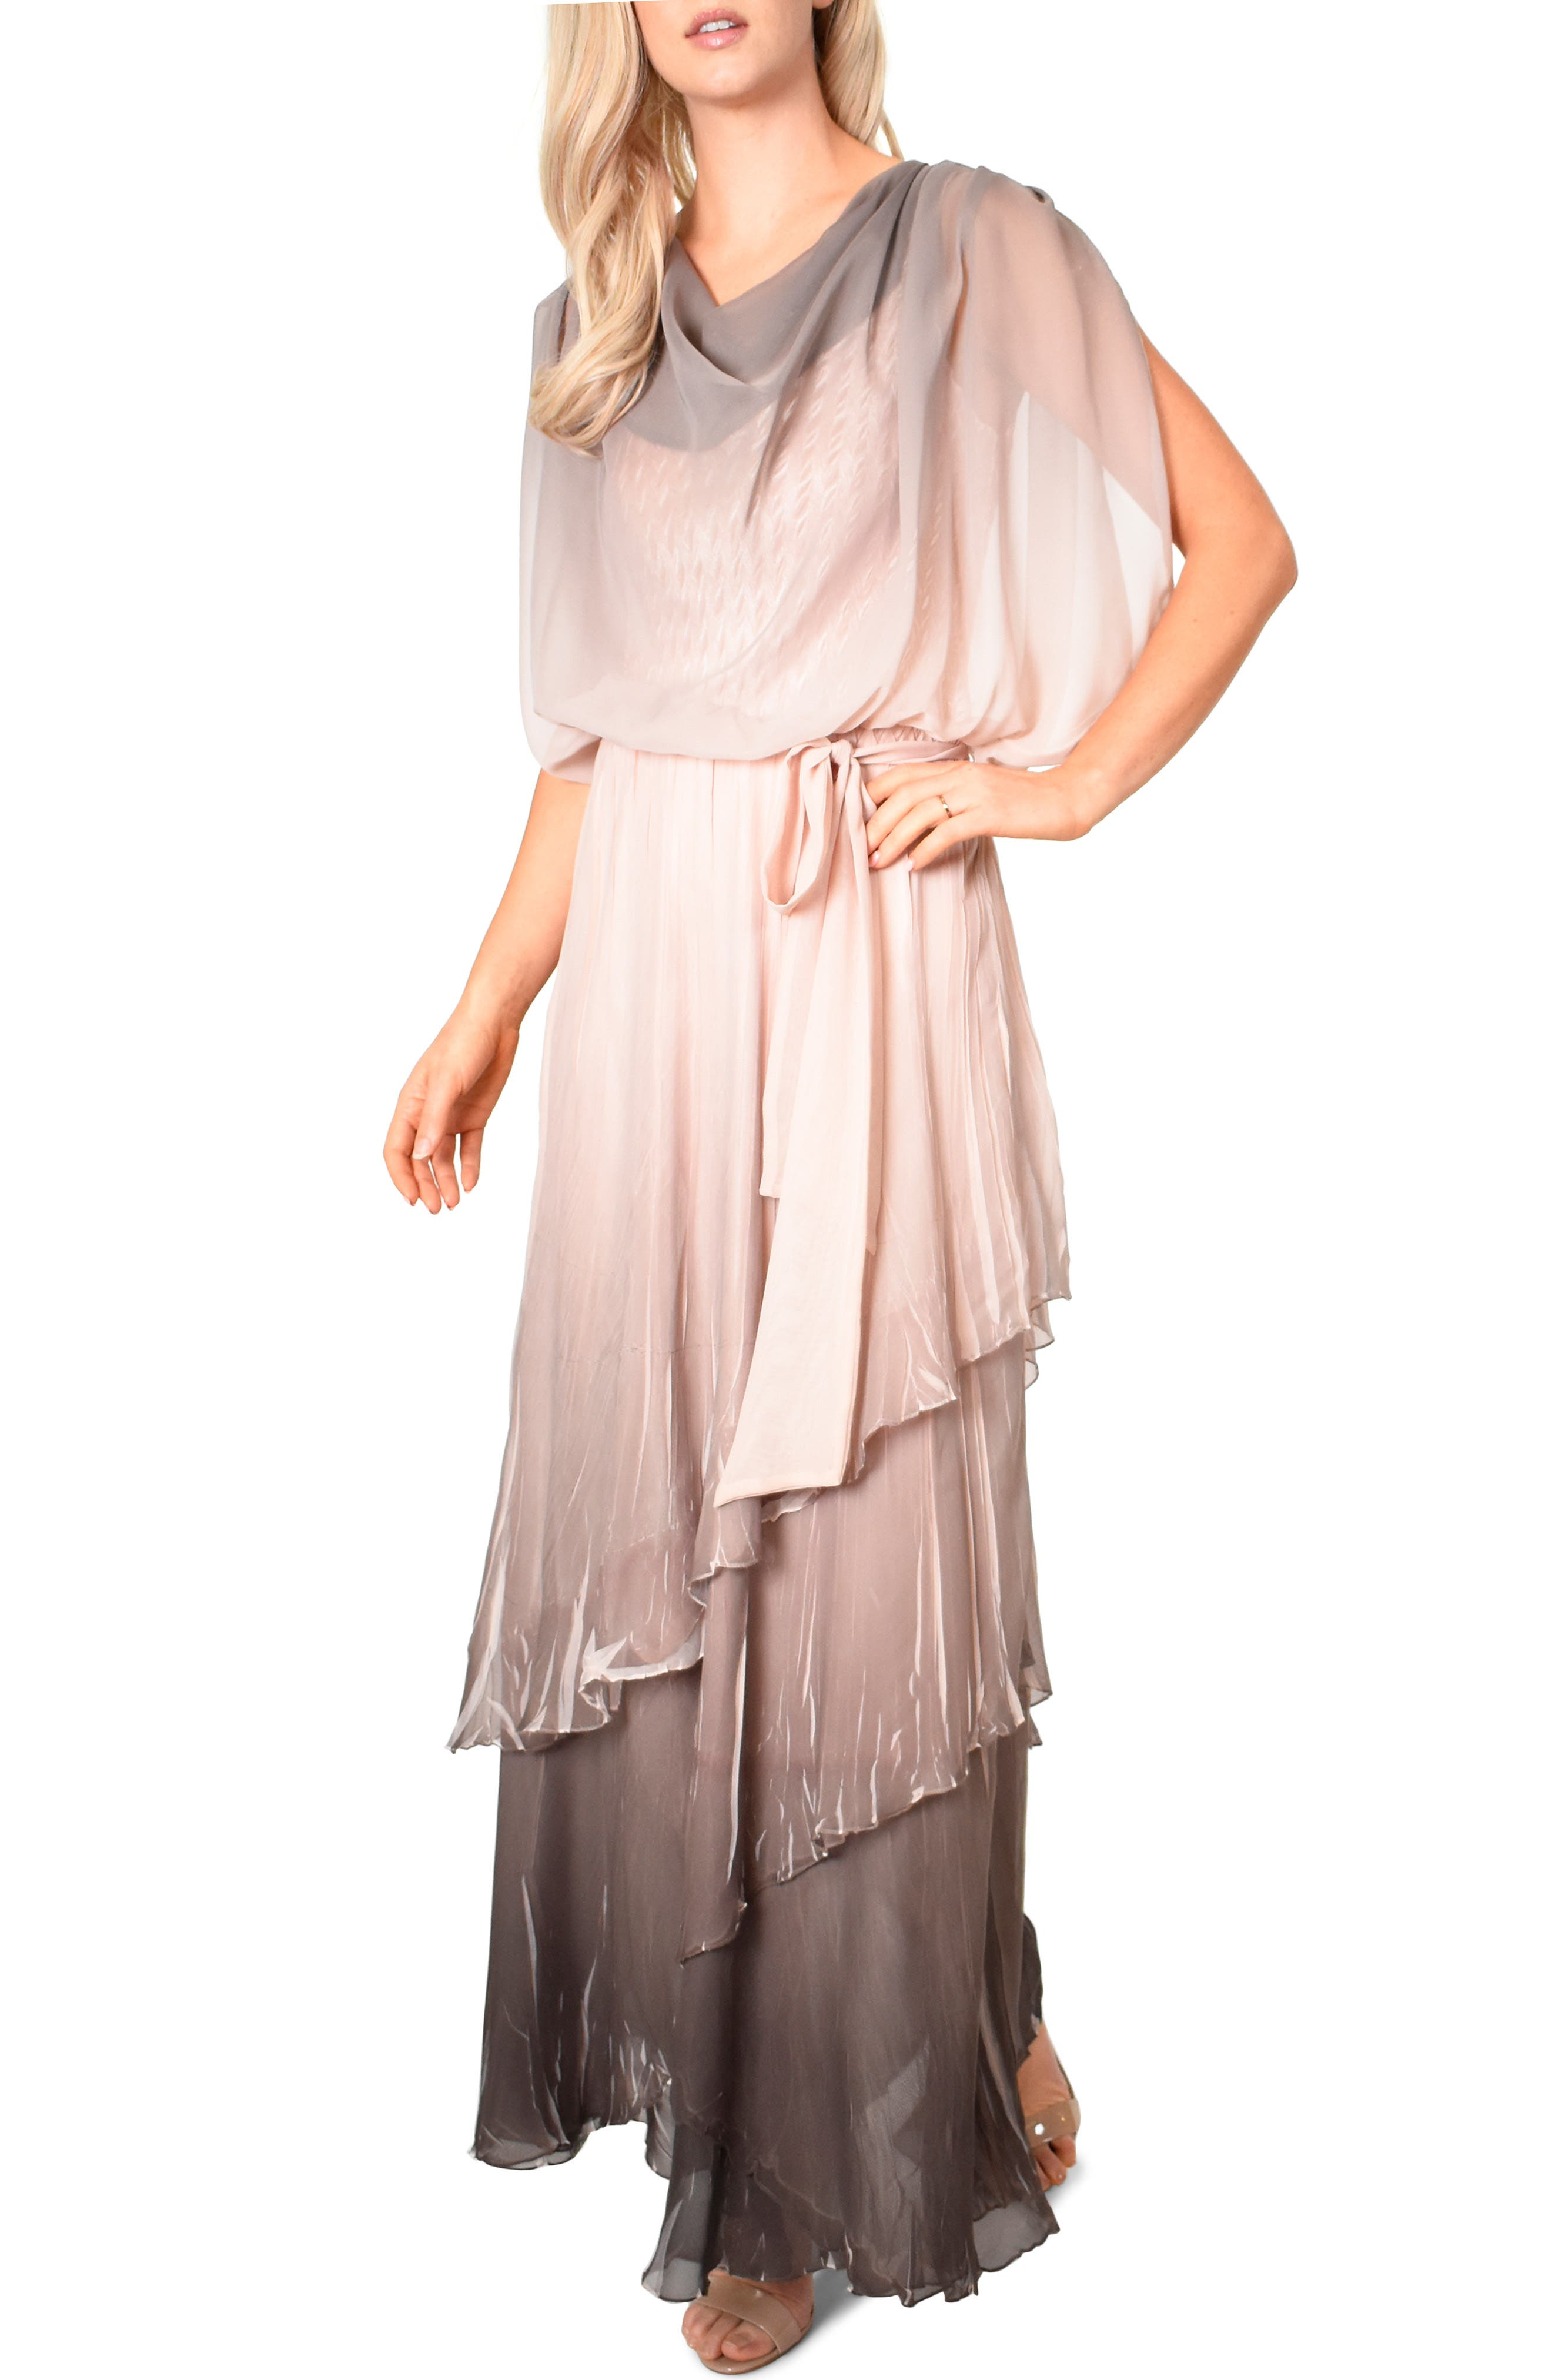 KOMAROV Drape Chiffon Gown, Main, color, 250